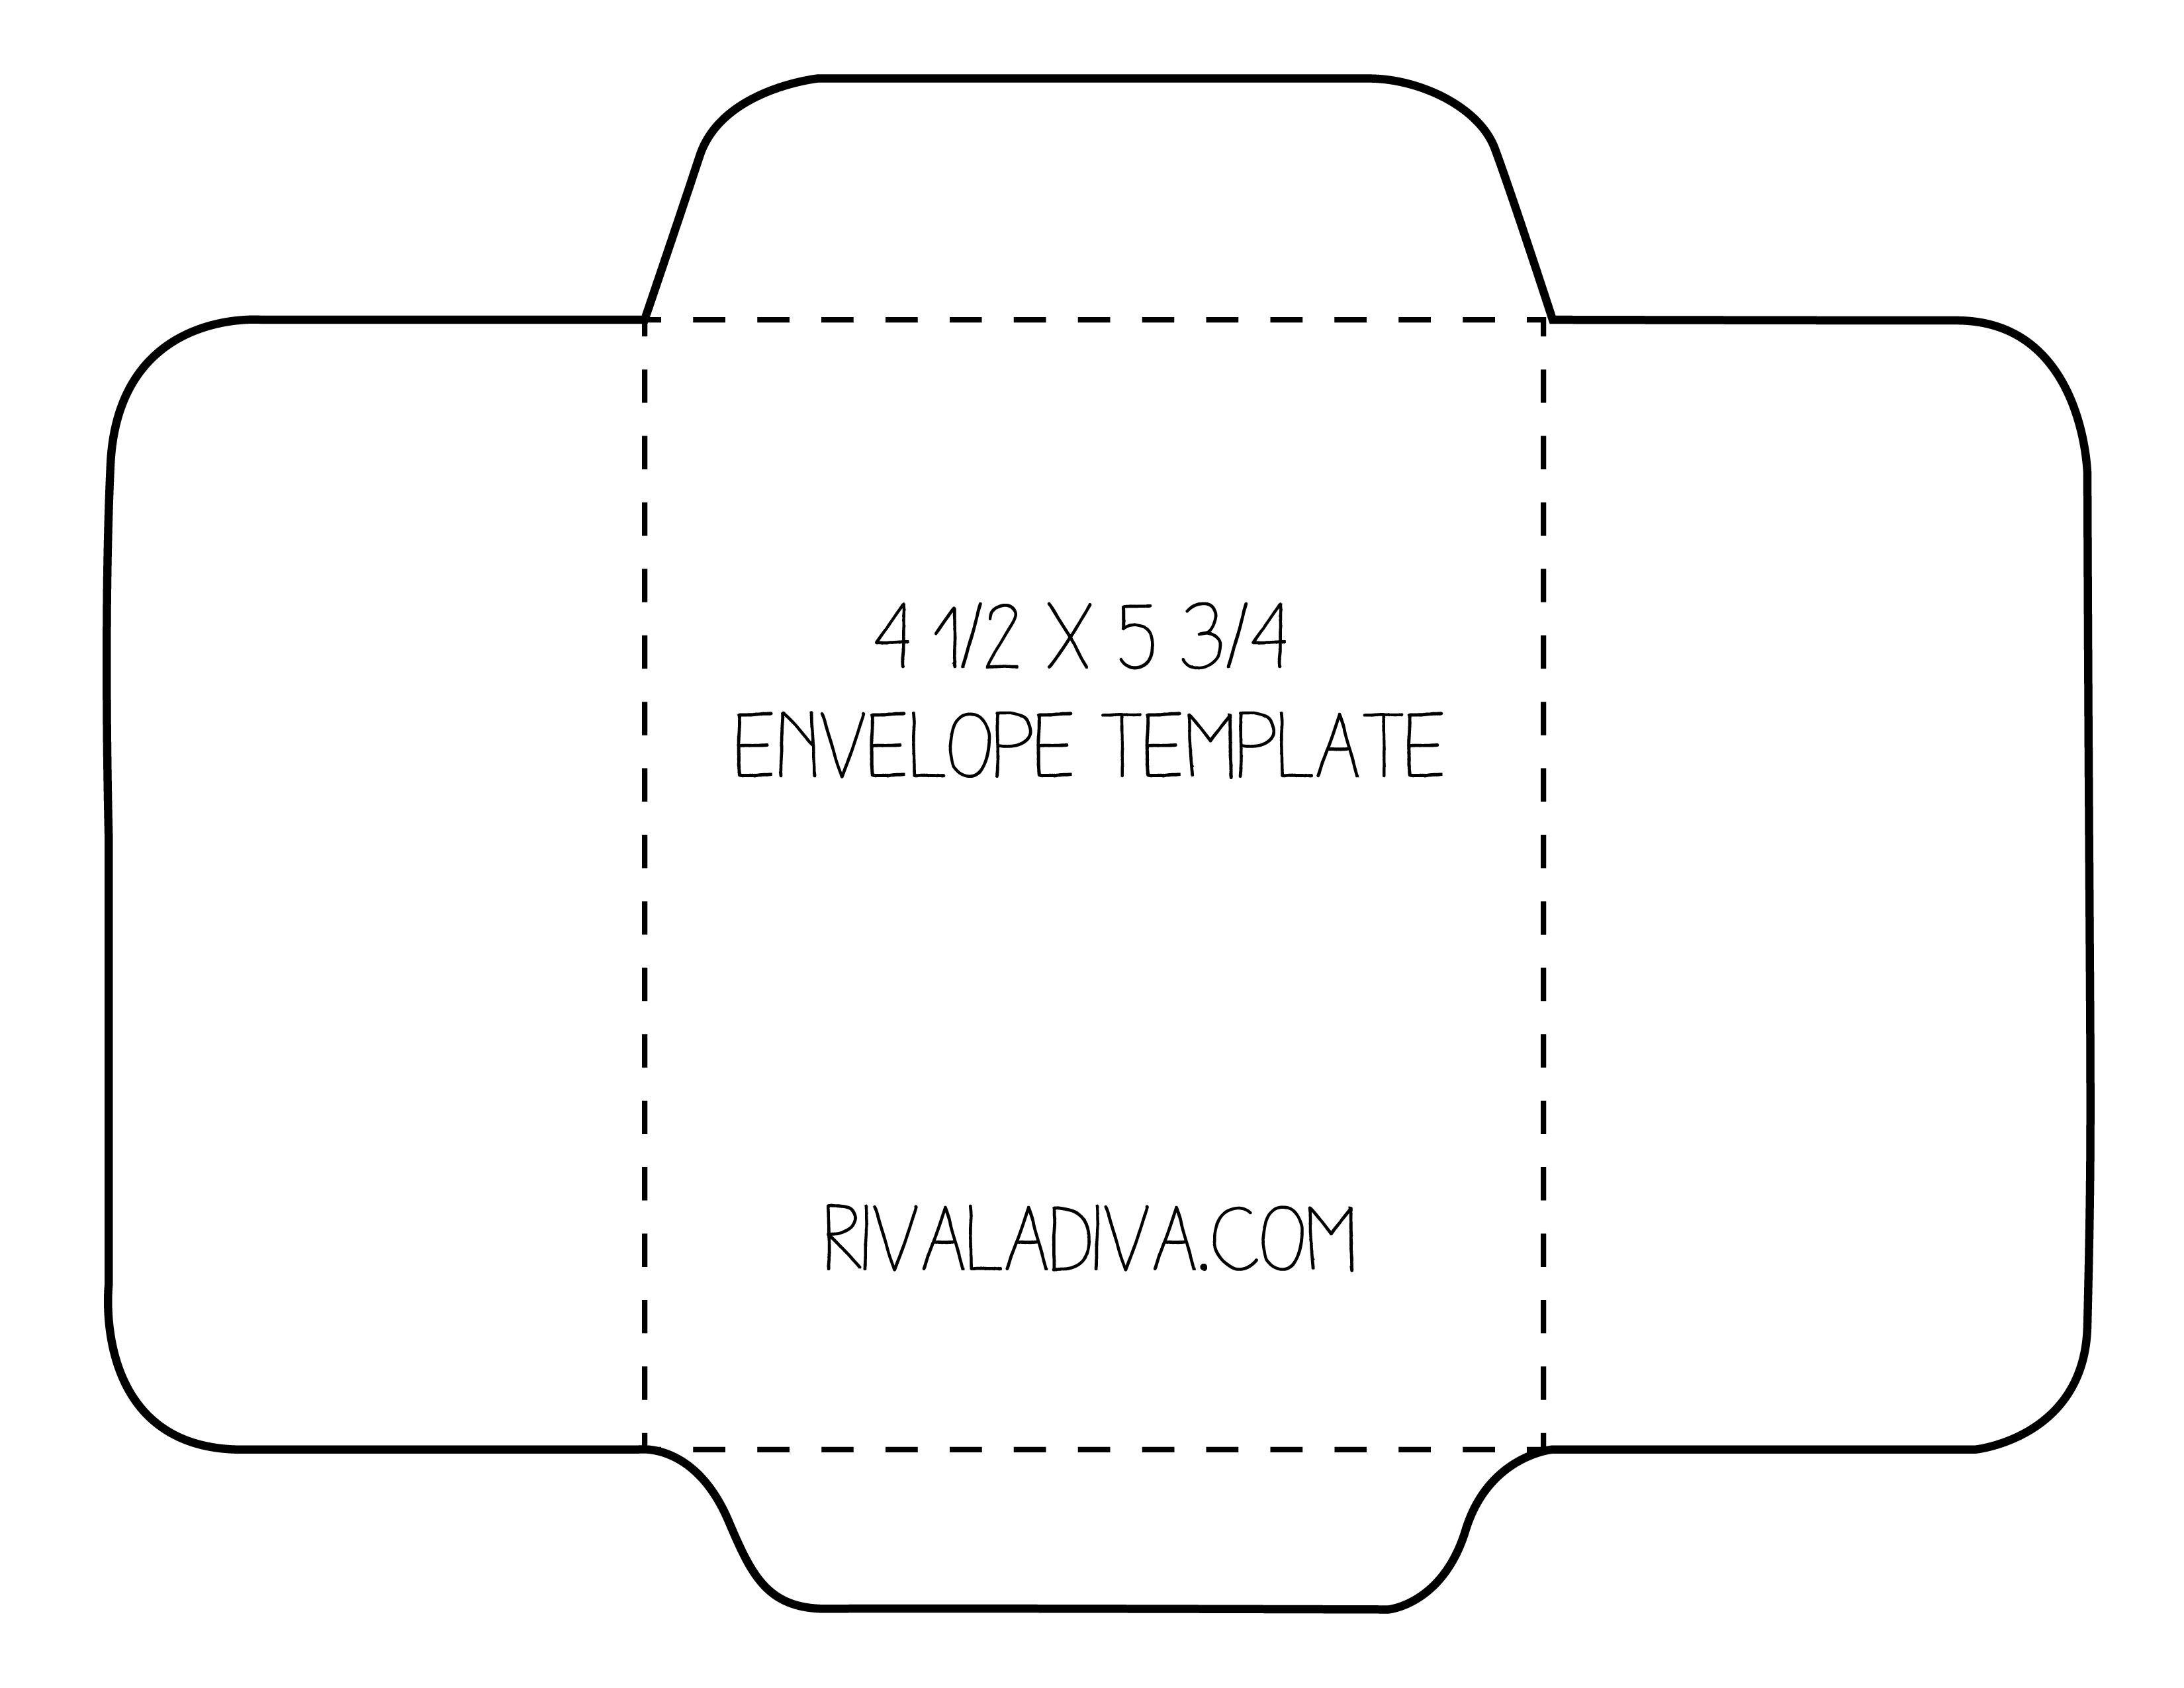 Envelope Template   Envelope Template For 8.5 X 11 Paper Diy - Free Printable Greeting Card Envelope Template